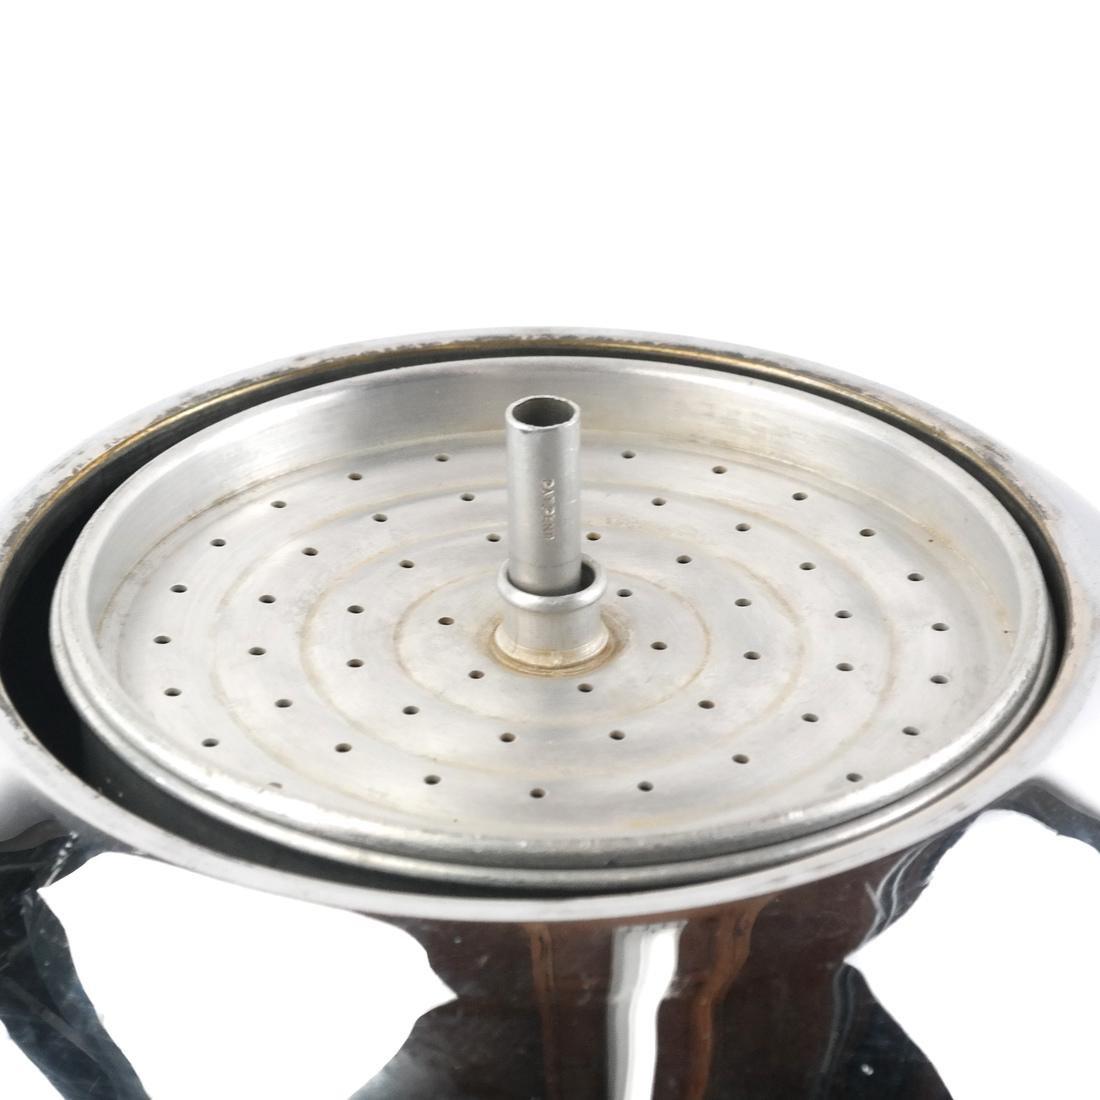 20th C. Modern Coffee Pot Chase USA - 6